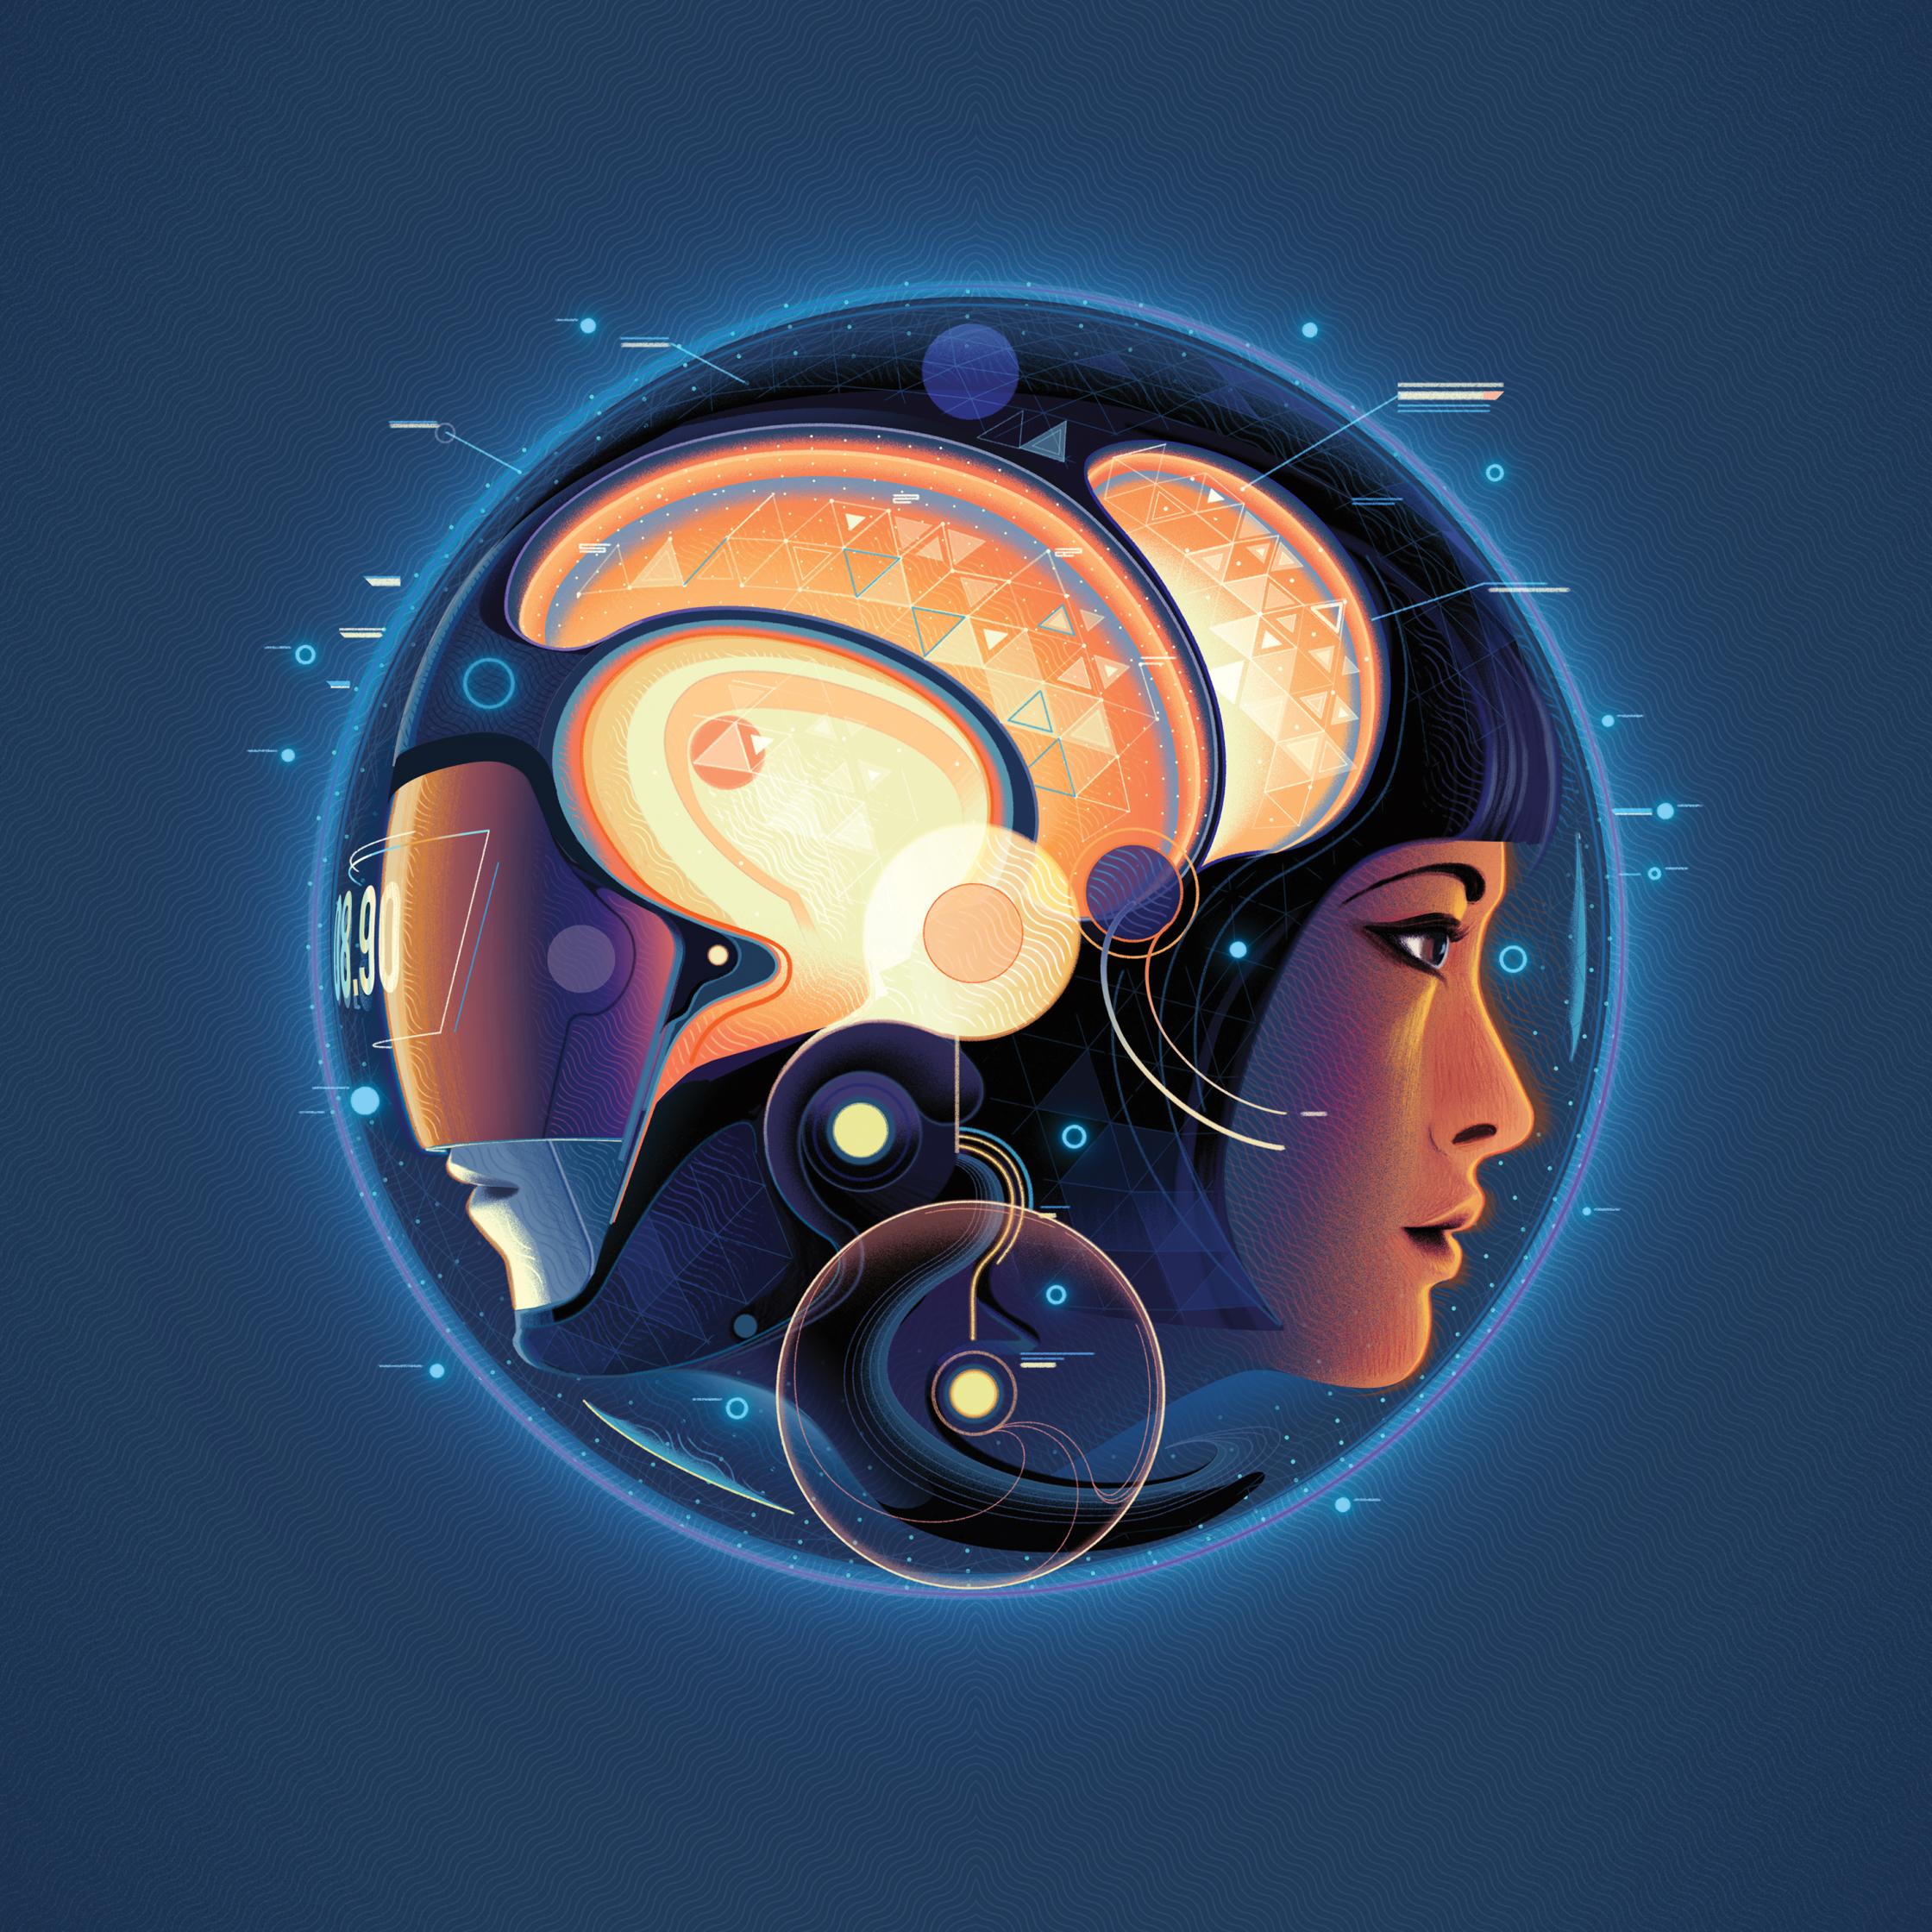 deloitte-cognitive-networks-hires01.jpg